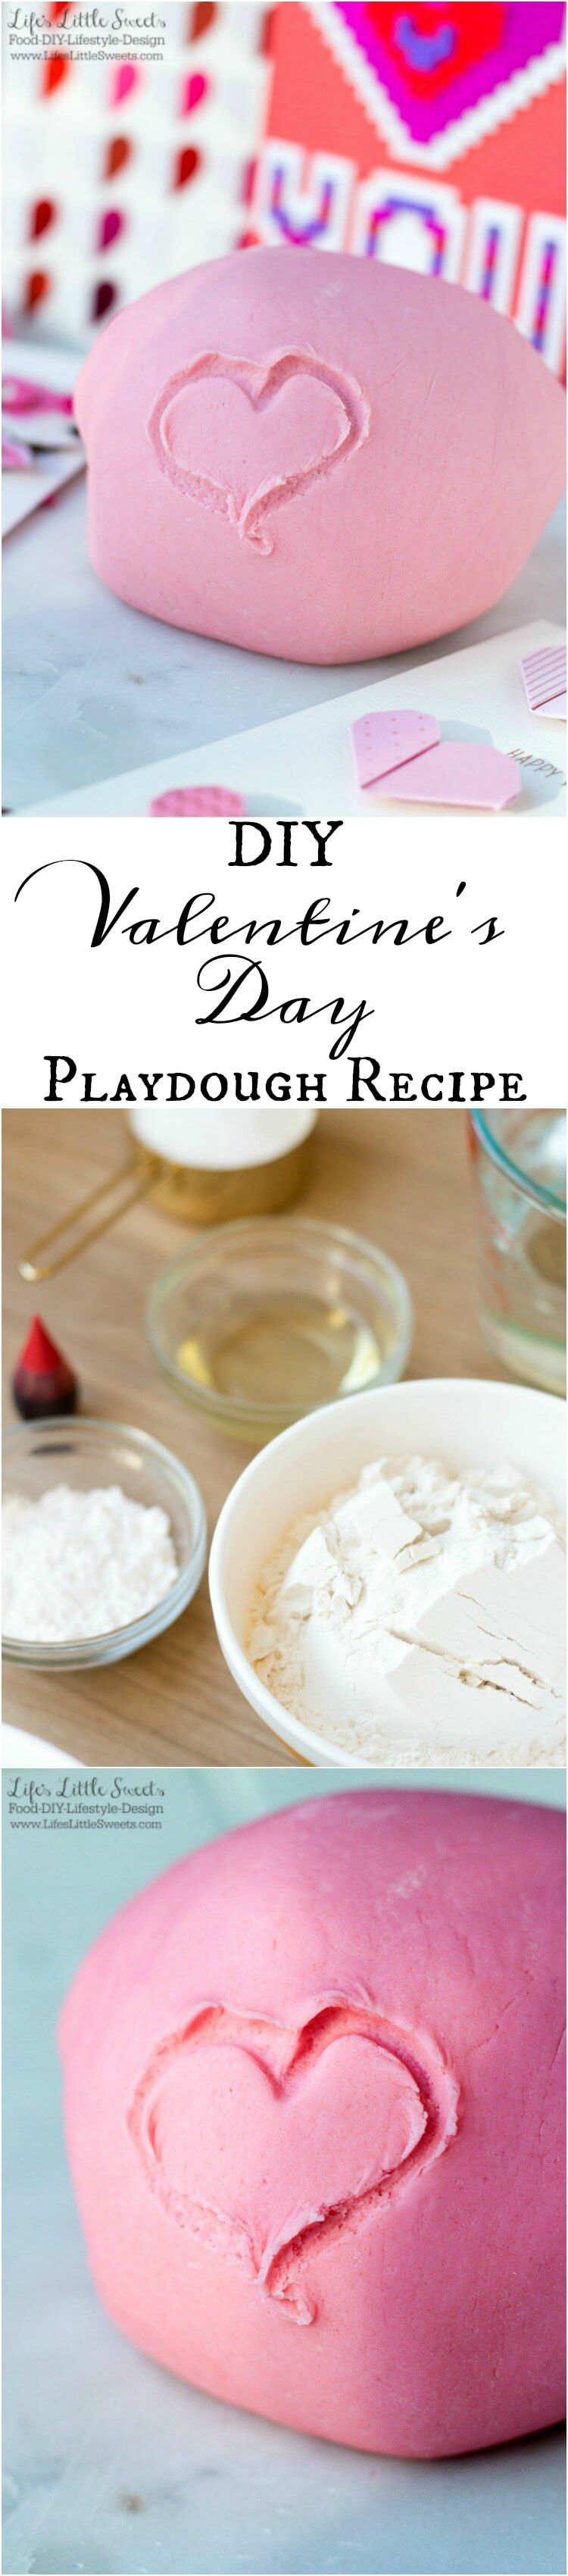 Diy valentines day playdough recipe recipe valentines